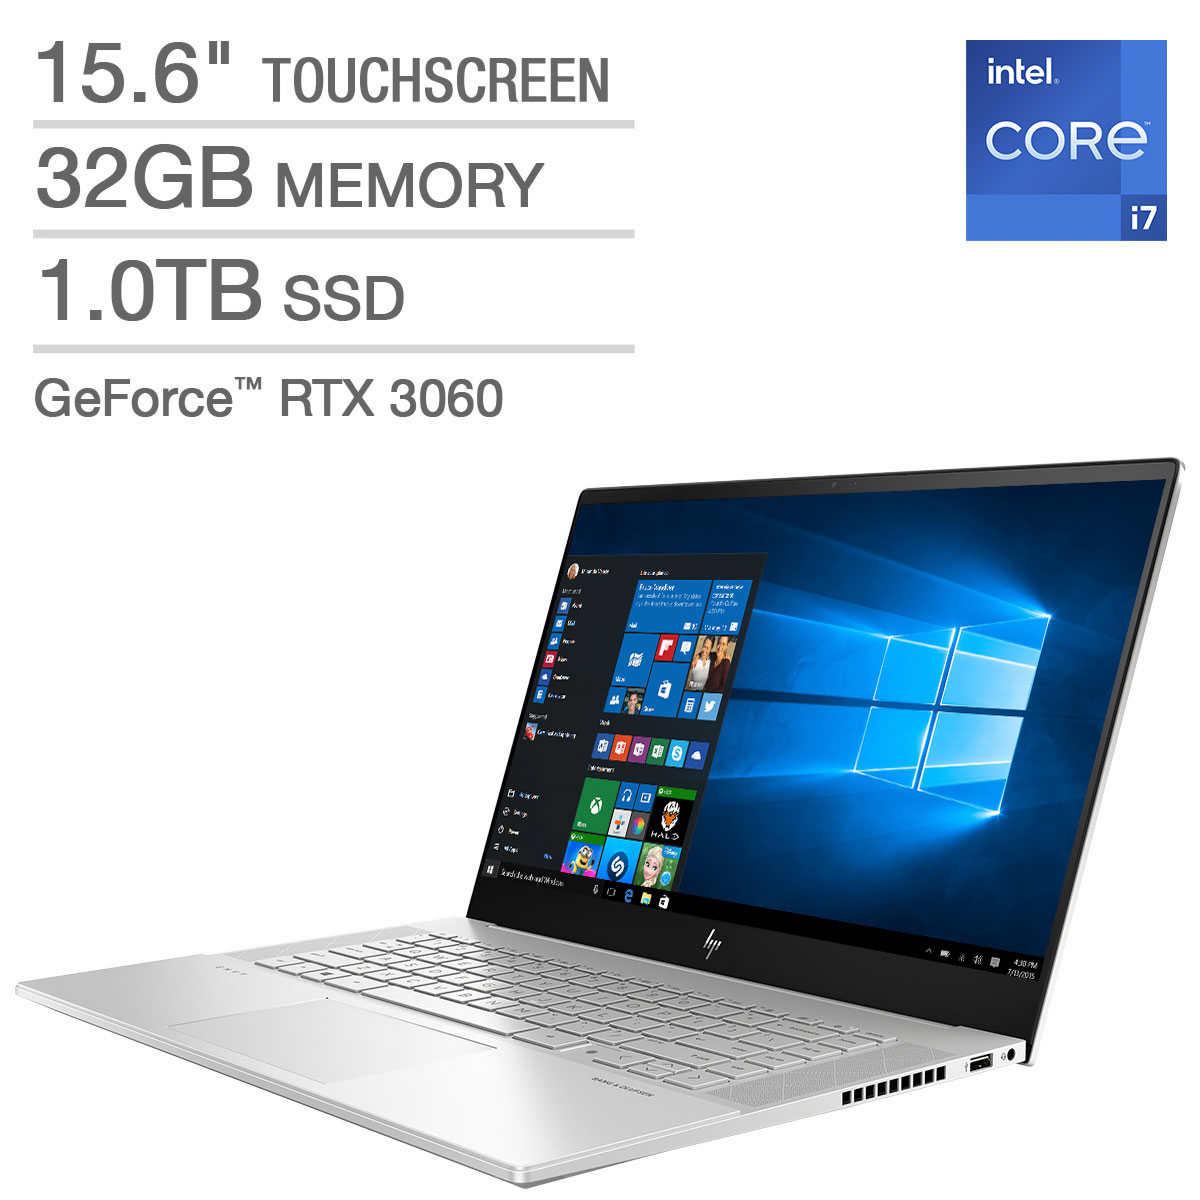 "HP ENVY 15.6"" Touchscreen Laptop - 11th Gen Intel Core i7-11800H - GeForce RTX 3060 - 1080p - Windows 10 Professional $1699"